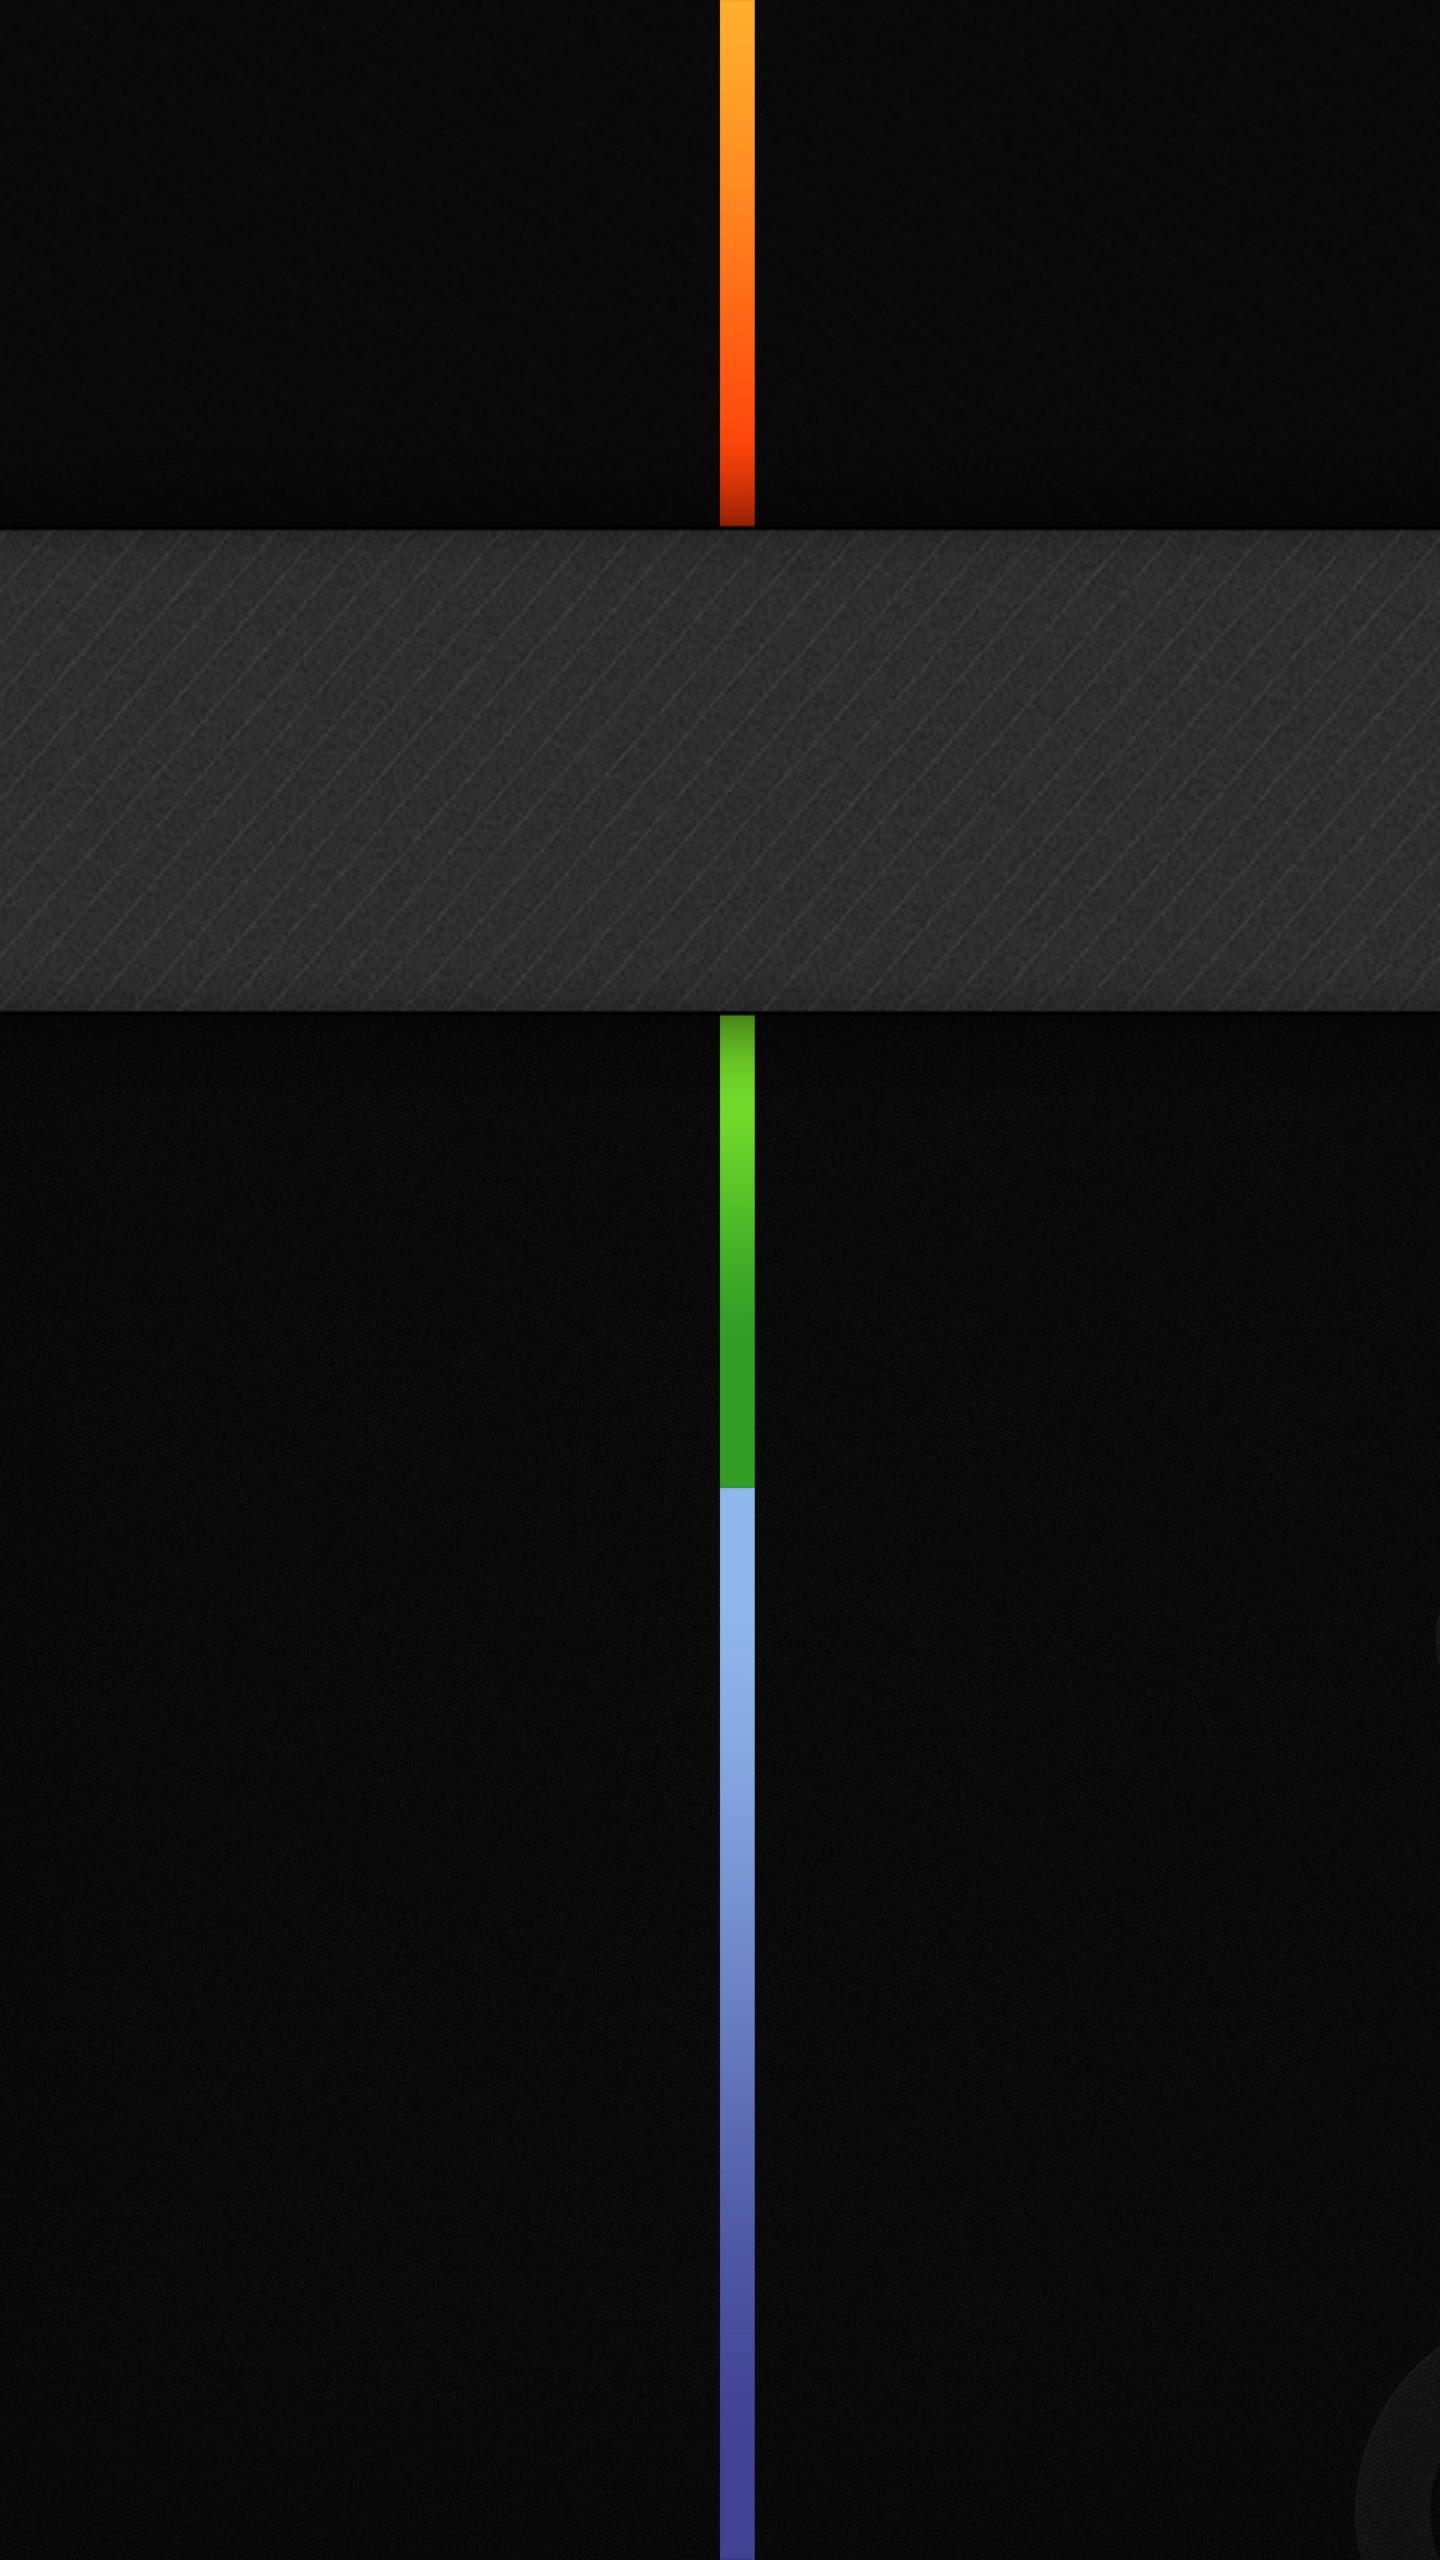 aandandroidblackcool smart phone wqhd wallpaper